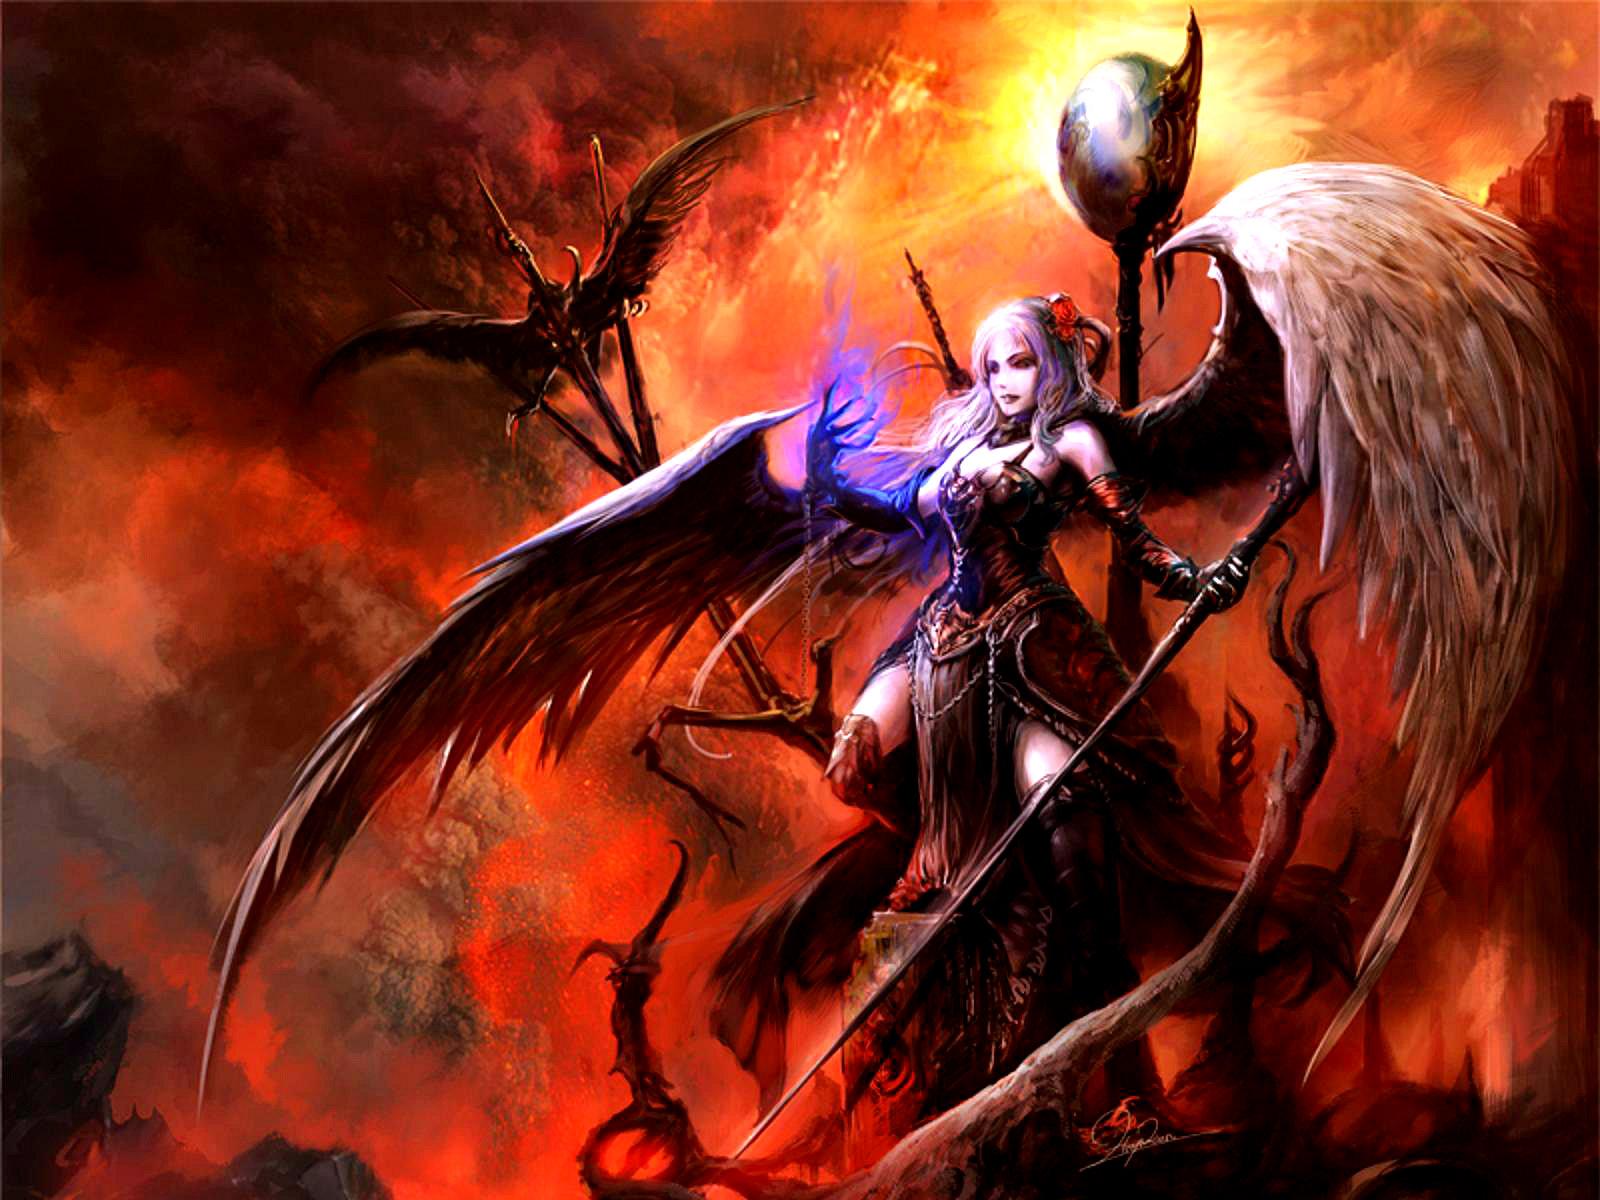 Fire Wallpaper Hd Wallpapers Fantasy Art Warrior Woman